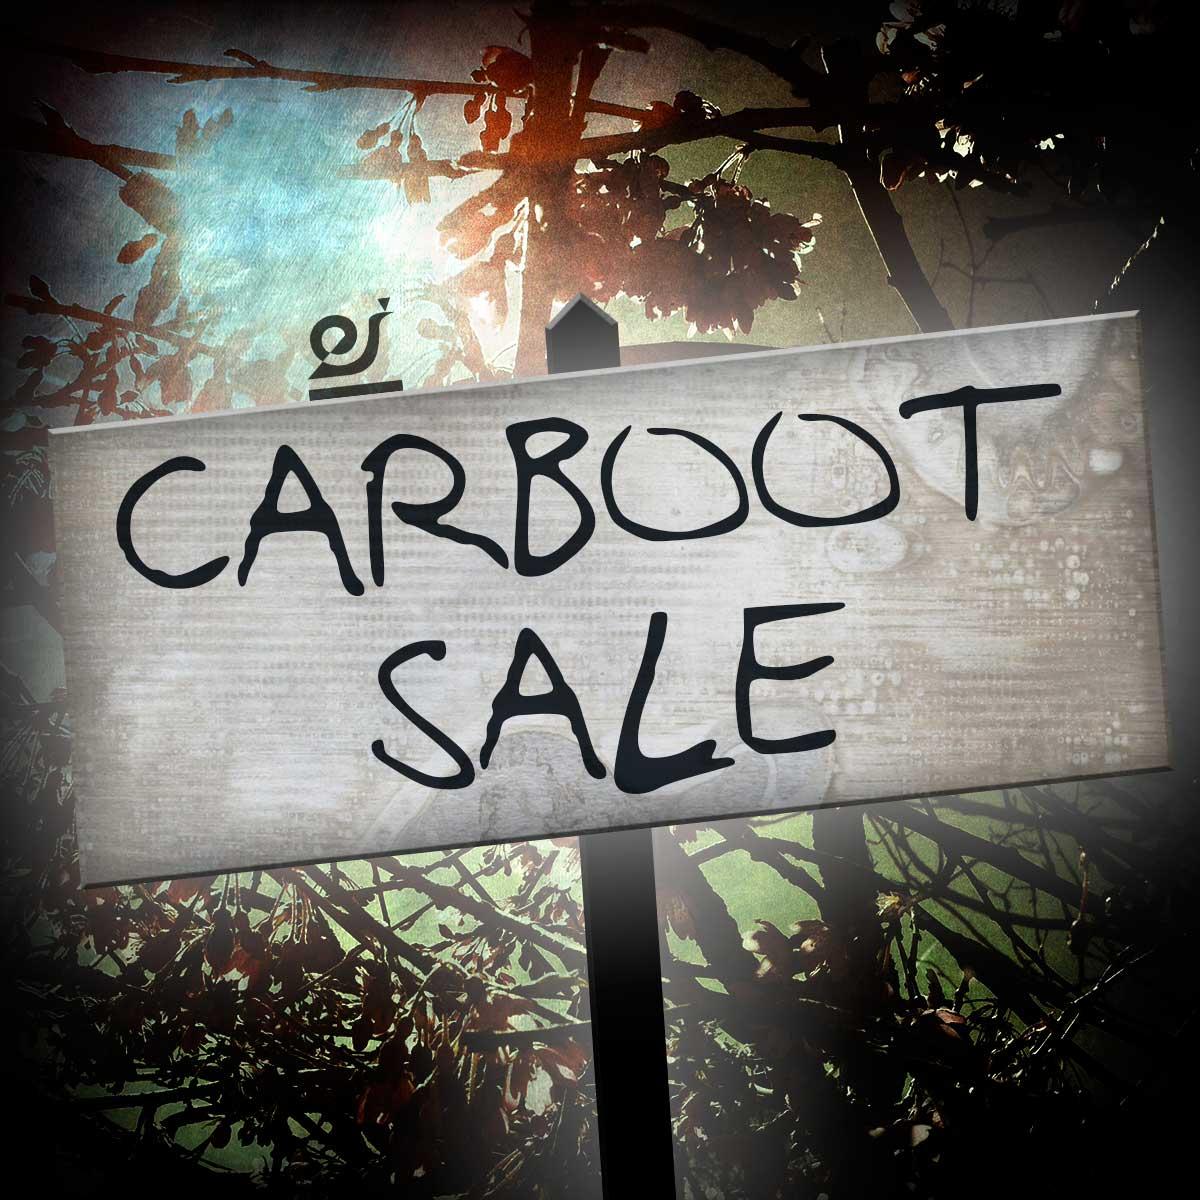 Car boot sale.